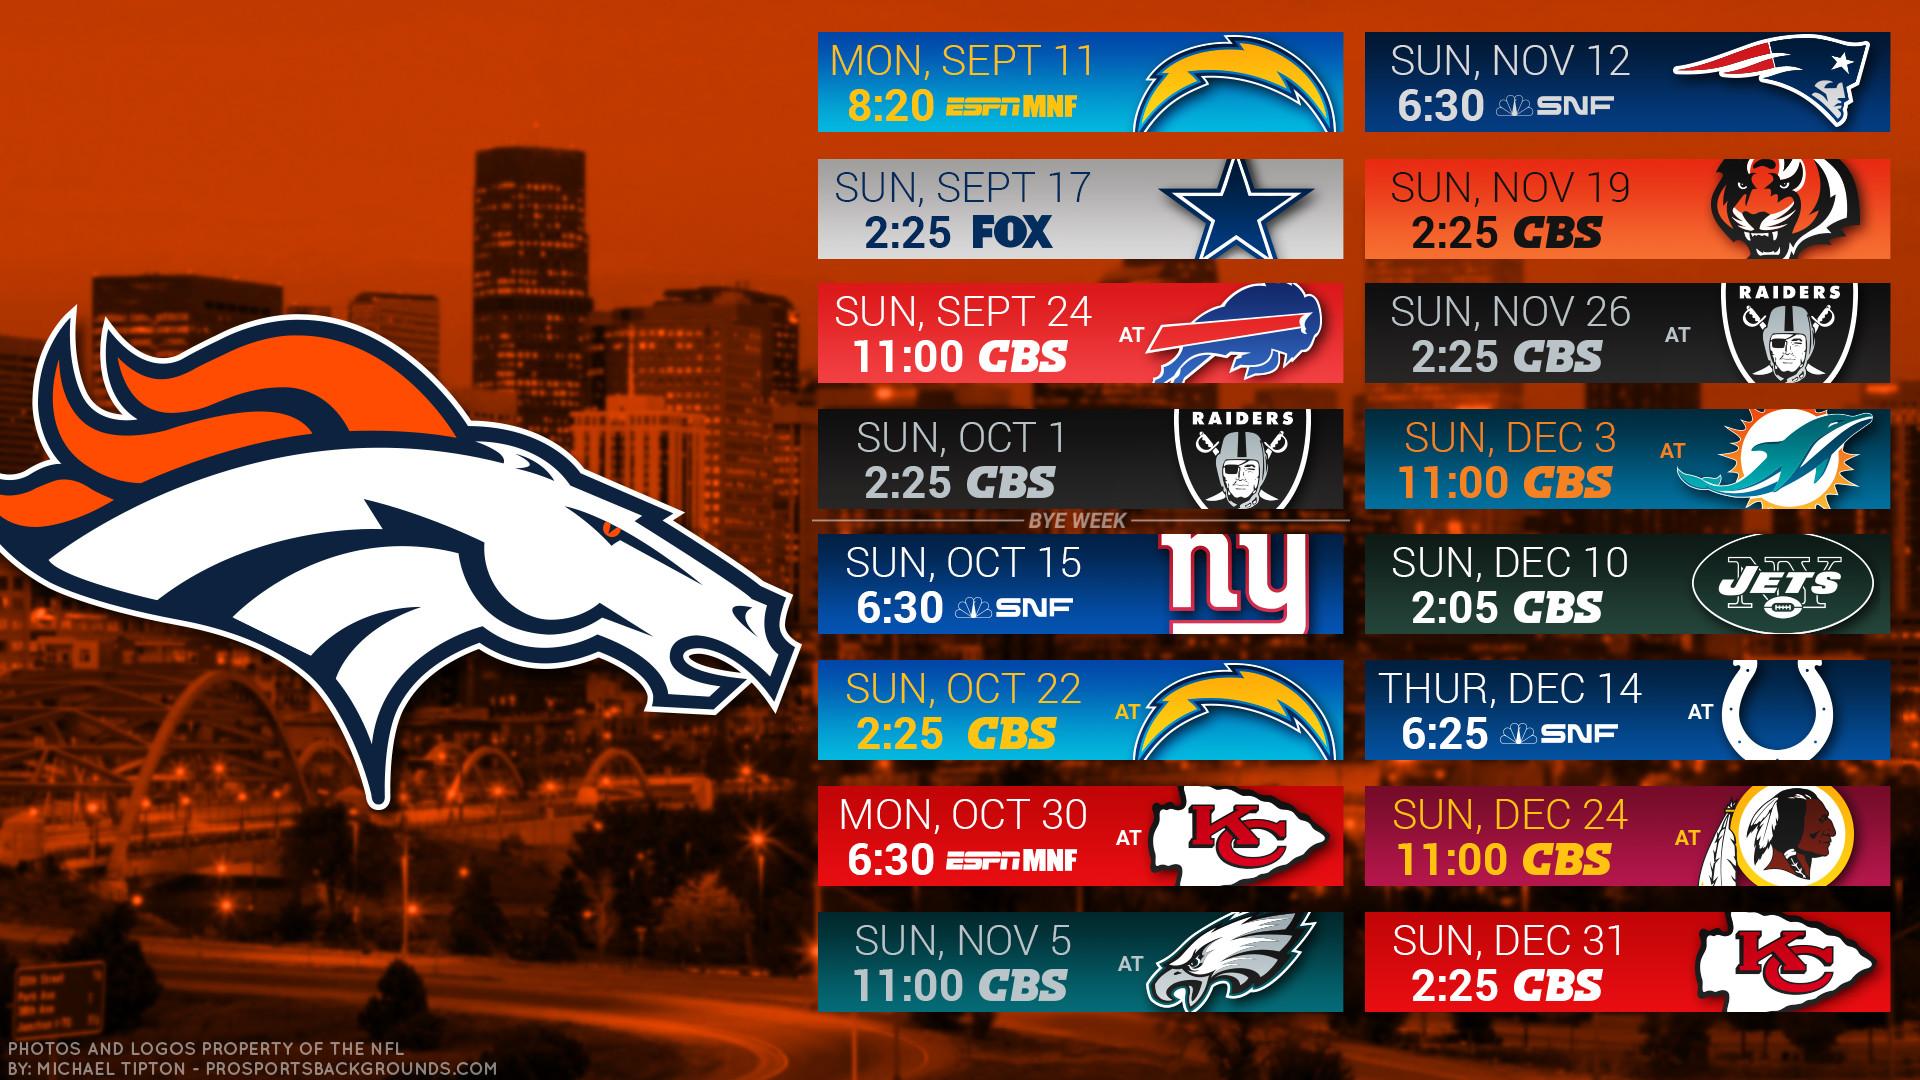 Denver Broncos 2017 schedule city football logo wallpaper free pc desktop  computer …